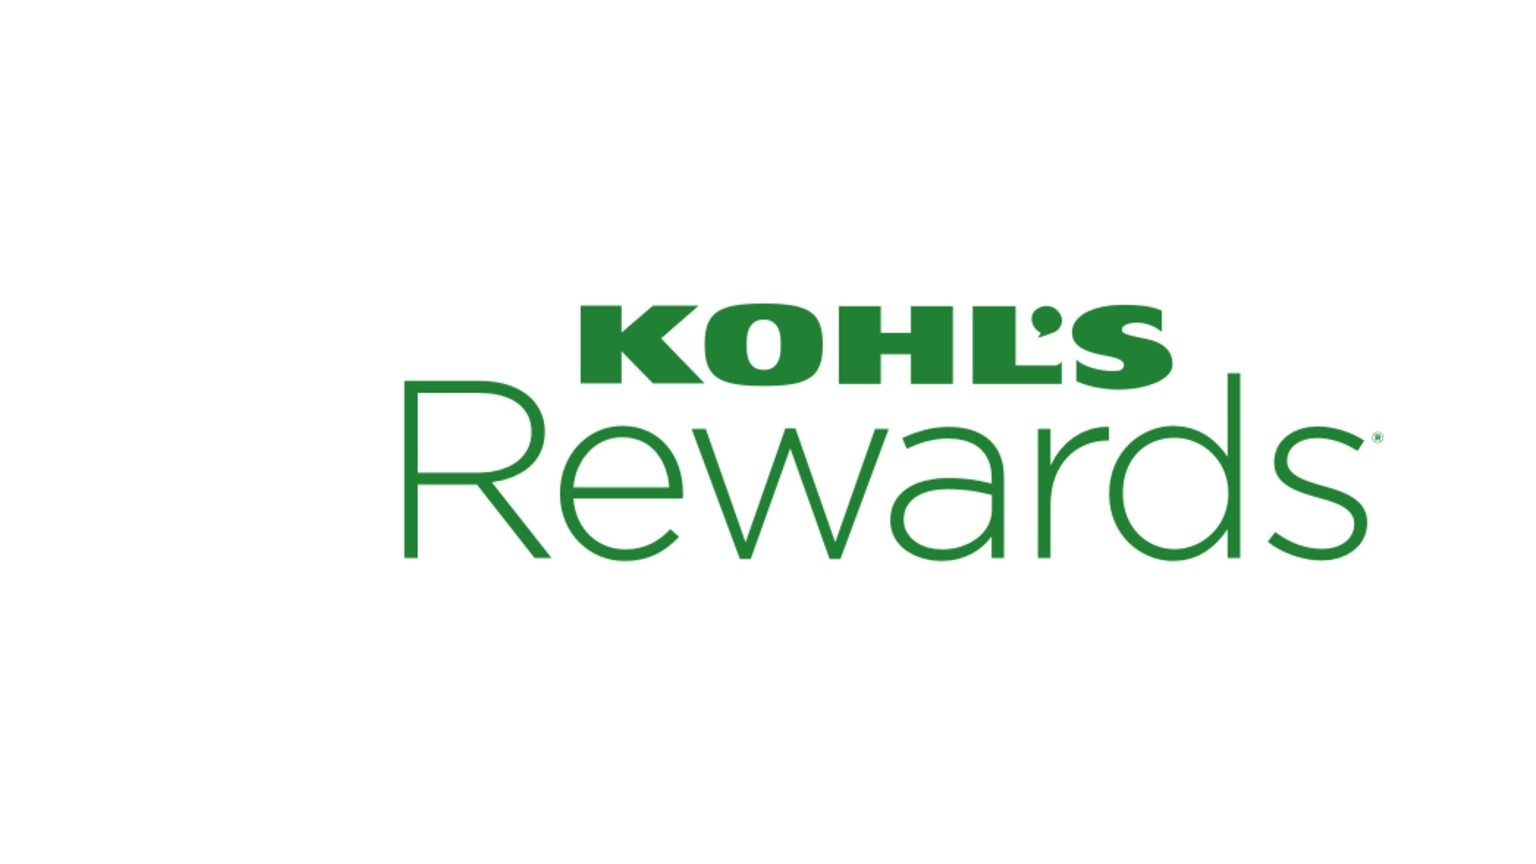 Kohls Rewards